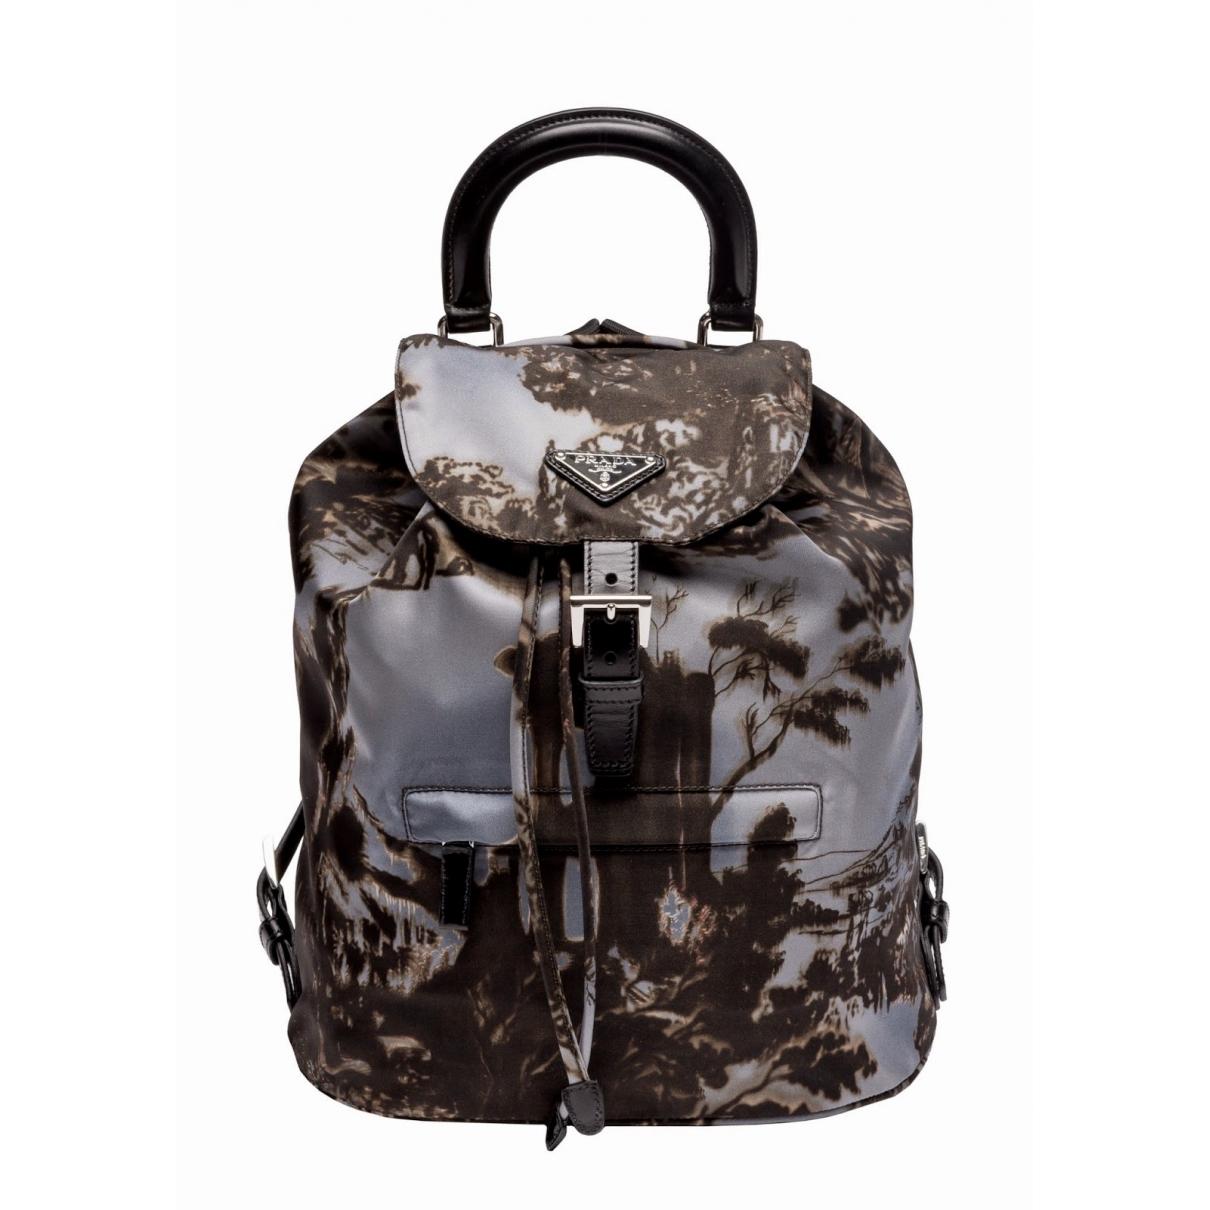 Prada \N Multicolour Cloth backpack for Women \N